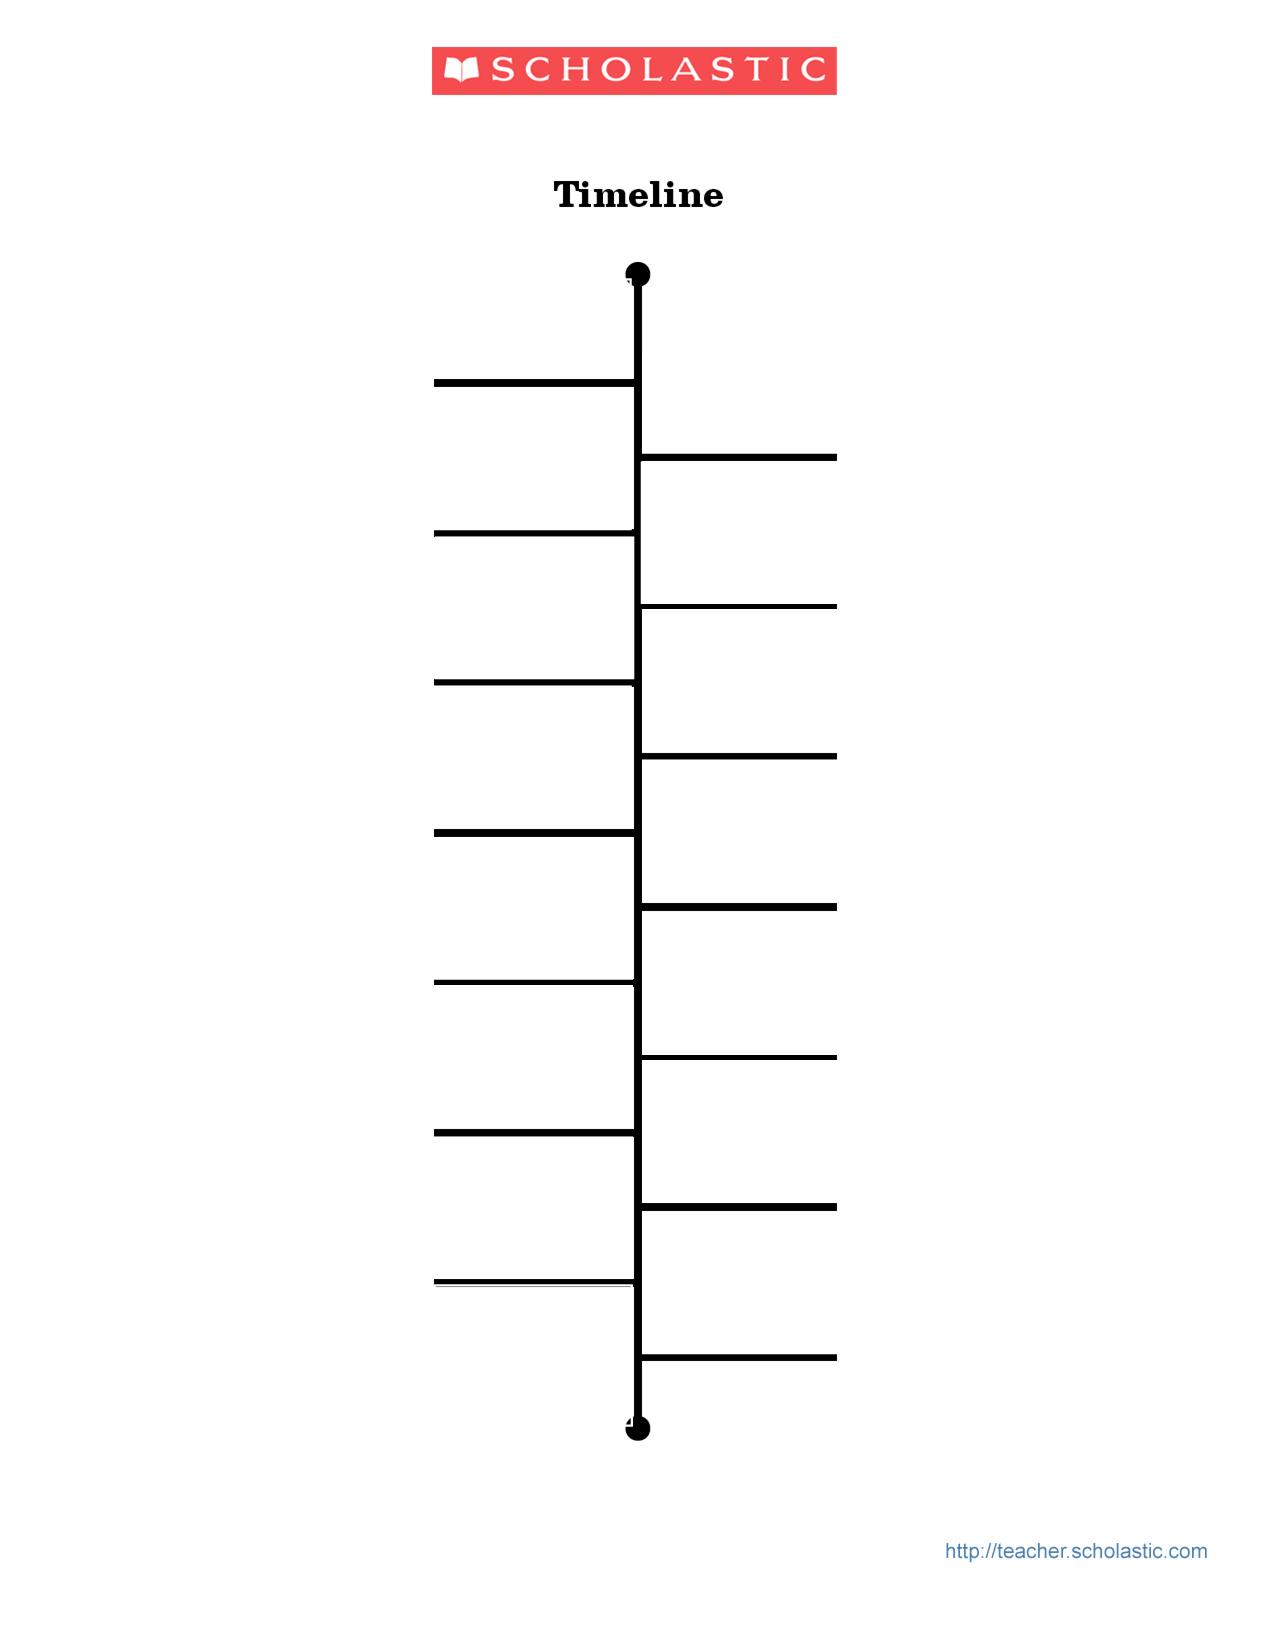 Blank Timeline Template 15 Blank Timeline Template 15 2 | Template - Free Blank Timeline Template Printable